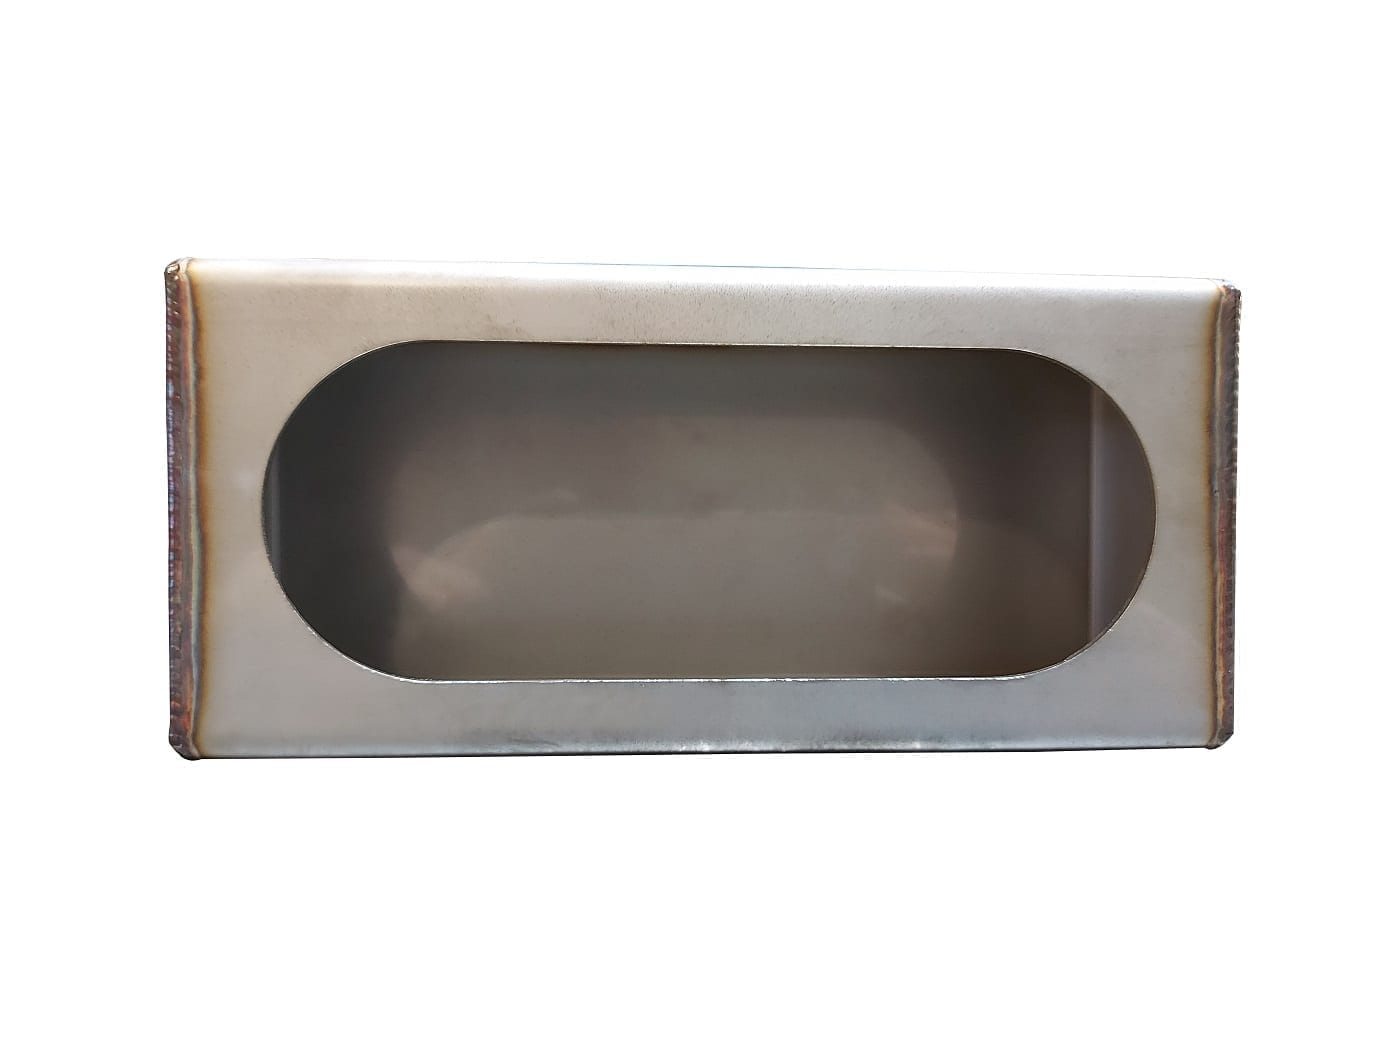 Stainless Steel Single Oval Light Box